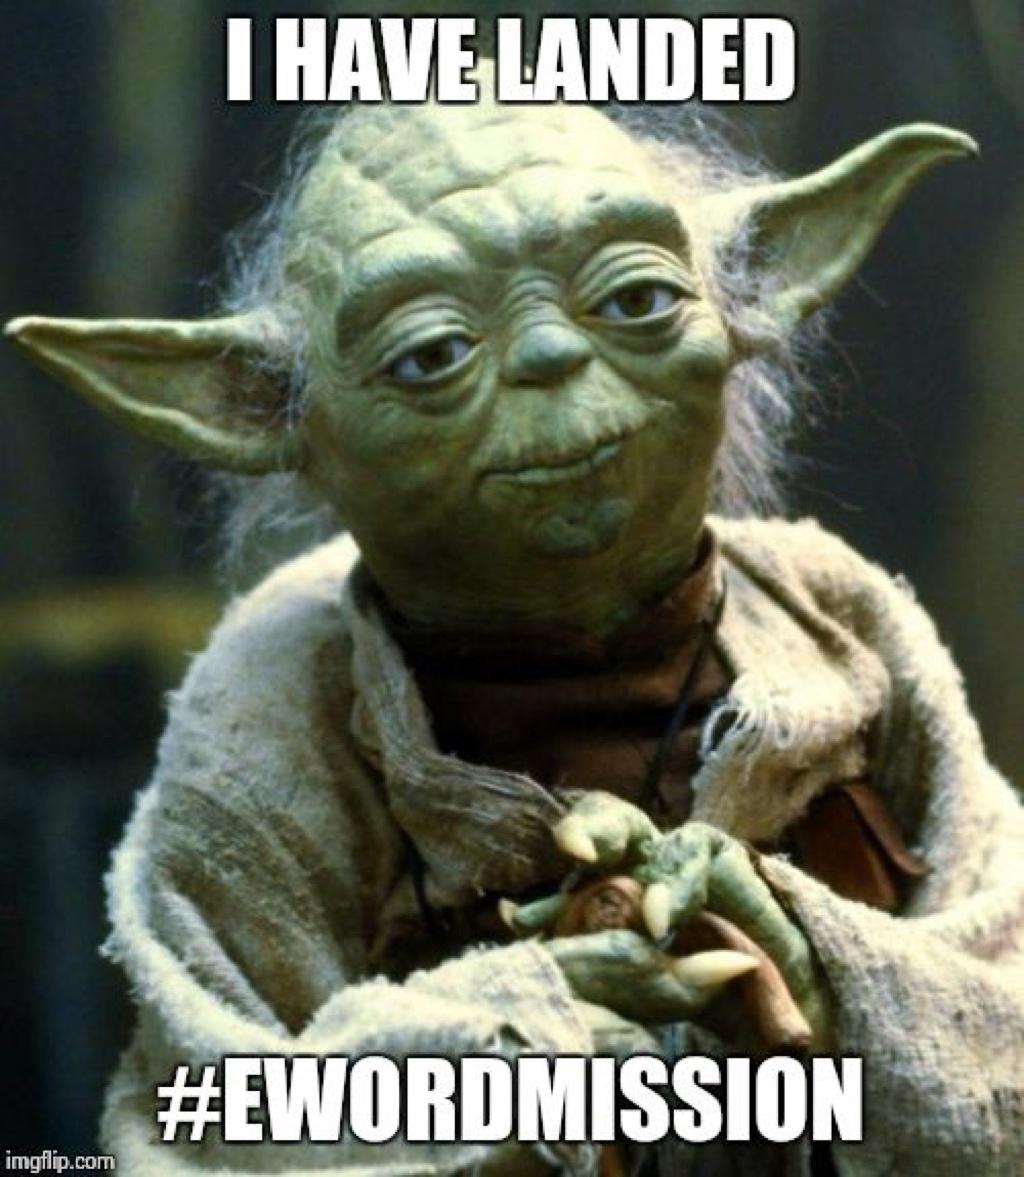 #ewordmission